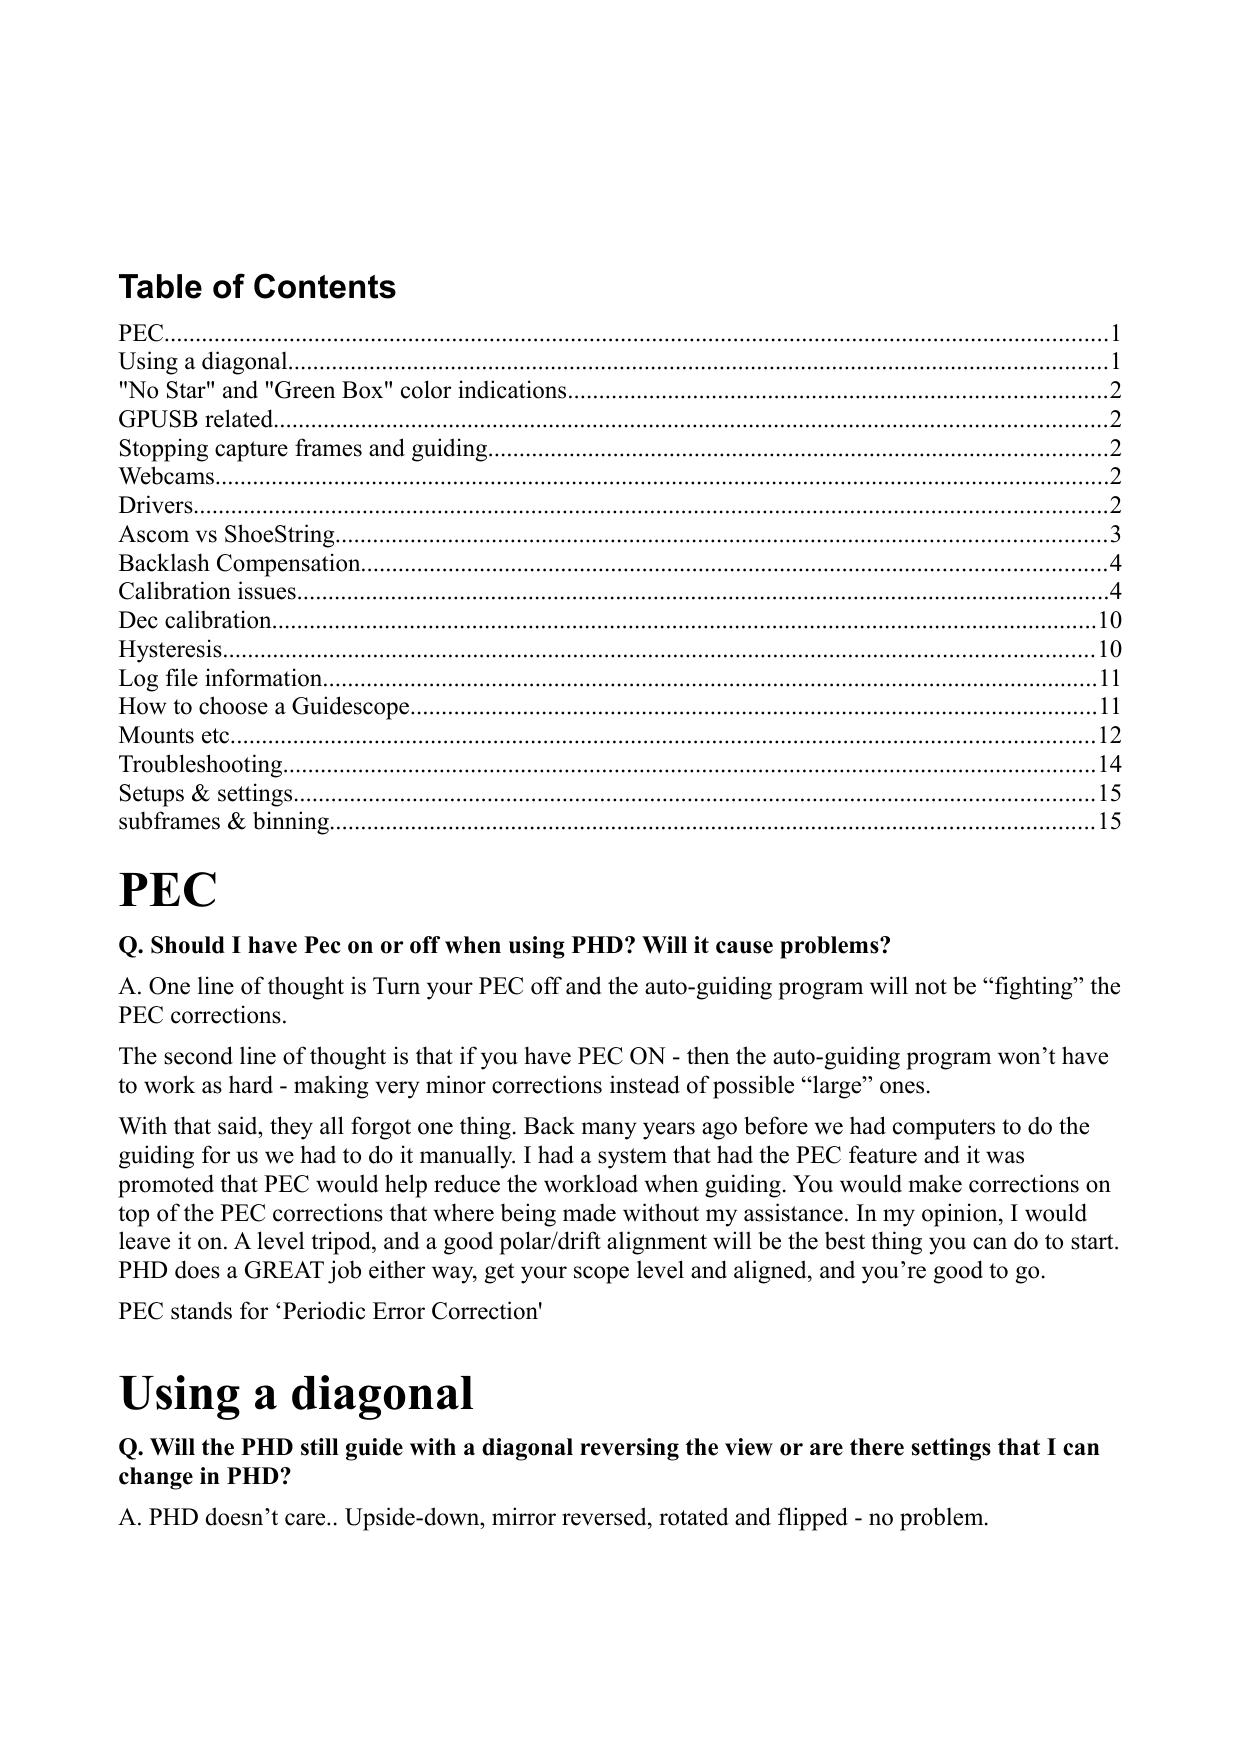 PEC Using a diagonal - Ruimtefotografie org